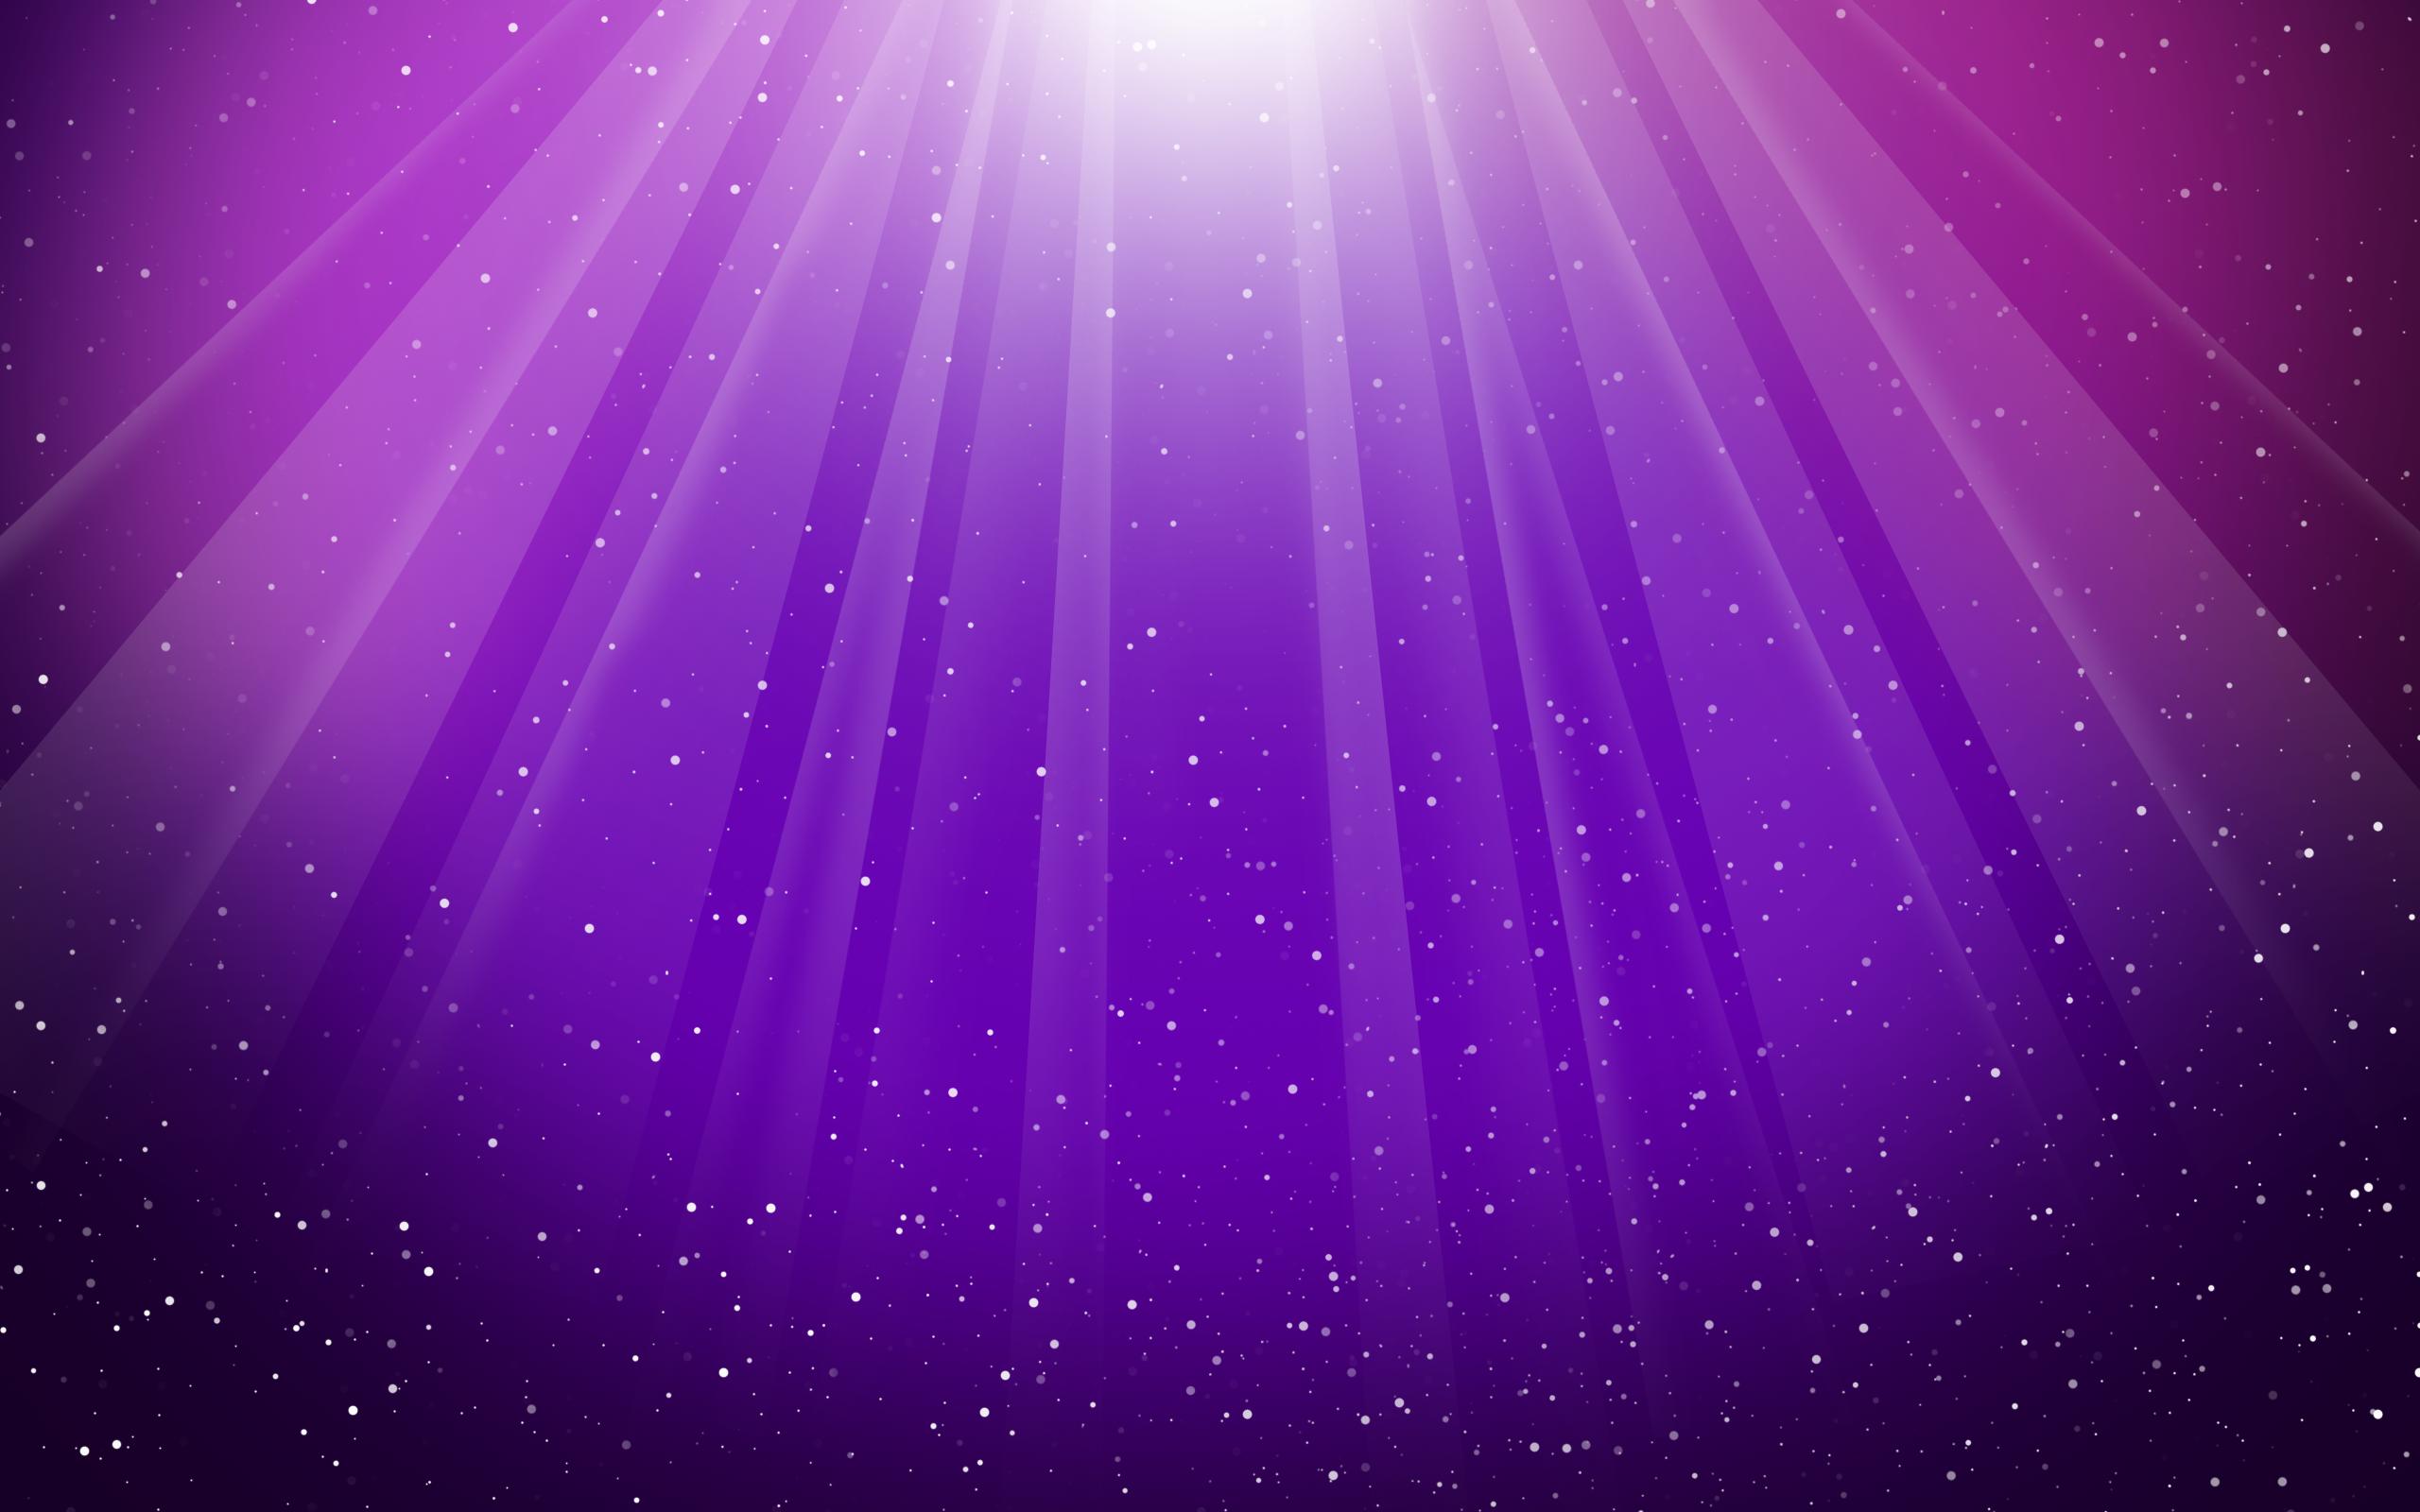 Purple wallpaper 1 2560x1600